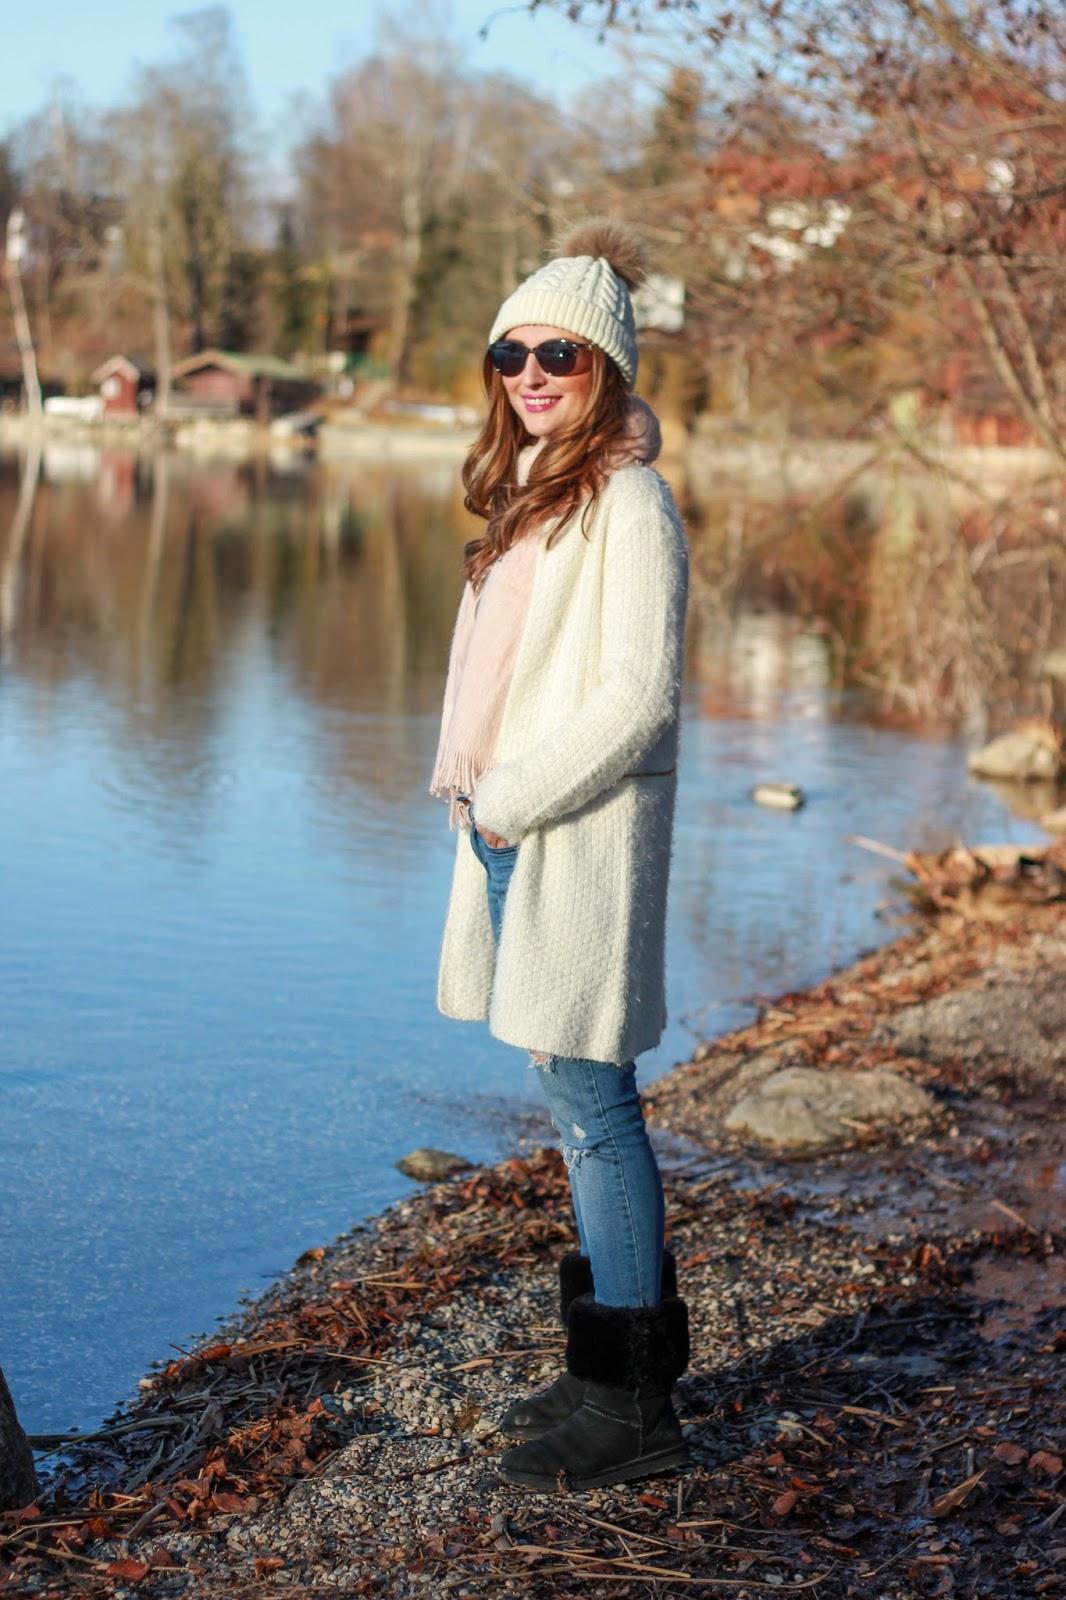 Fashionstylebyjohanna  - Fashionblogger aus Frankfurt - Frankfurt Fashionblogger - Modeblogger aus Frankfurt - Blogger aus Frankfurt